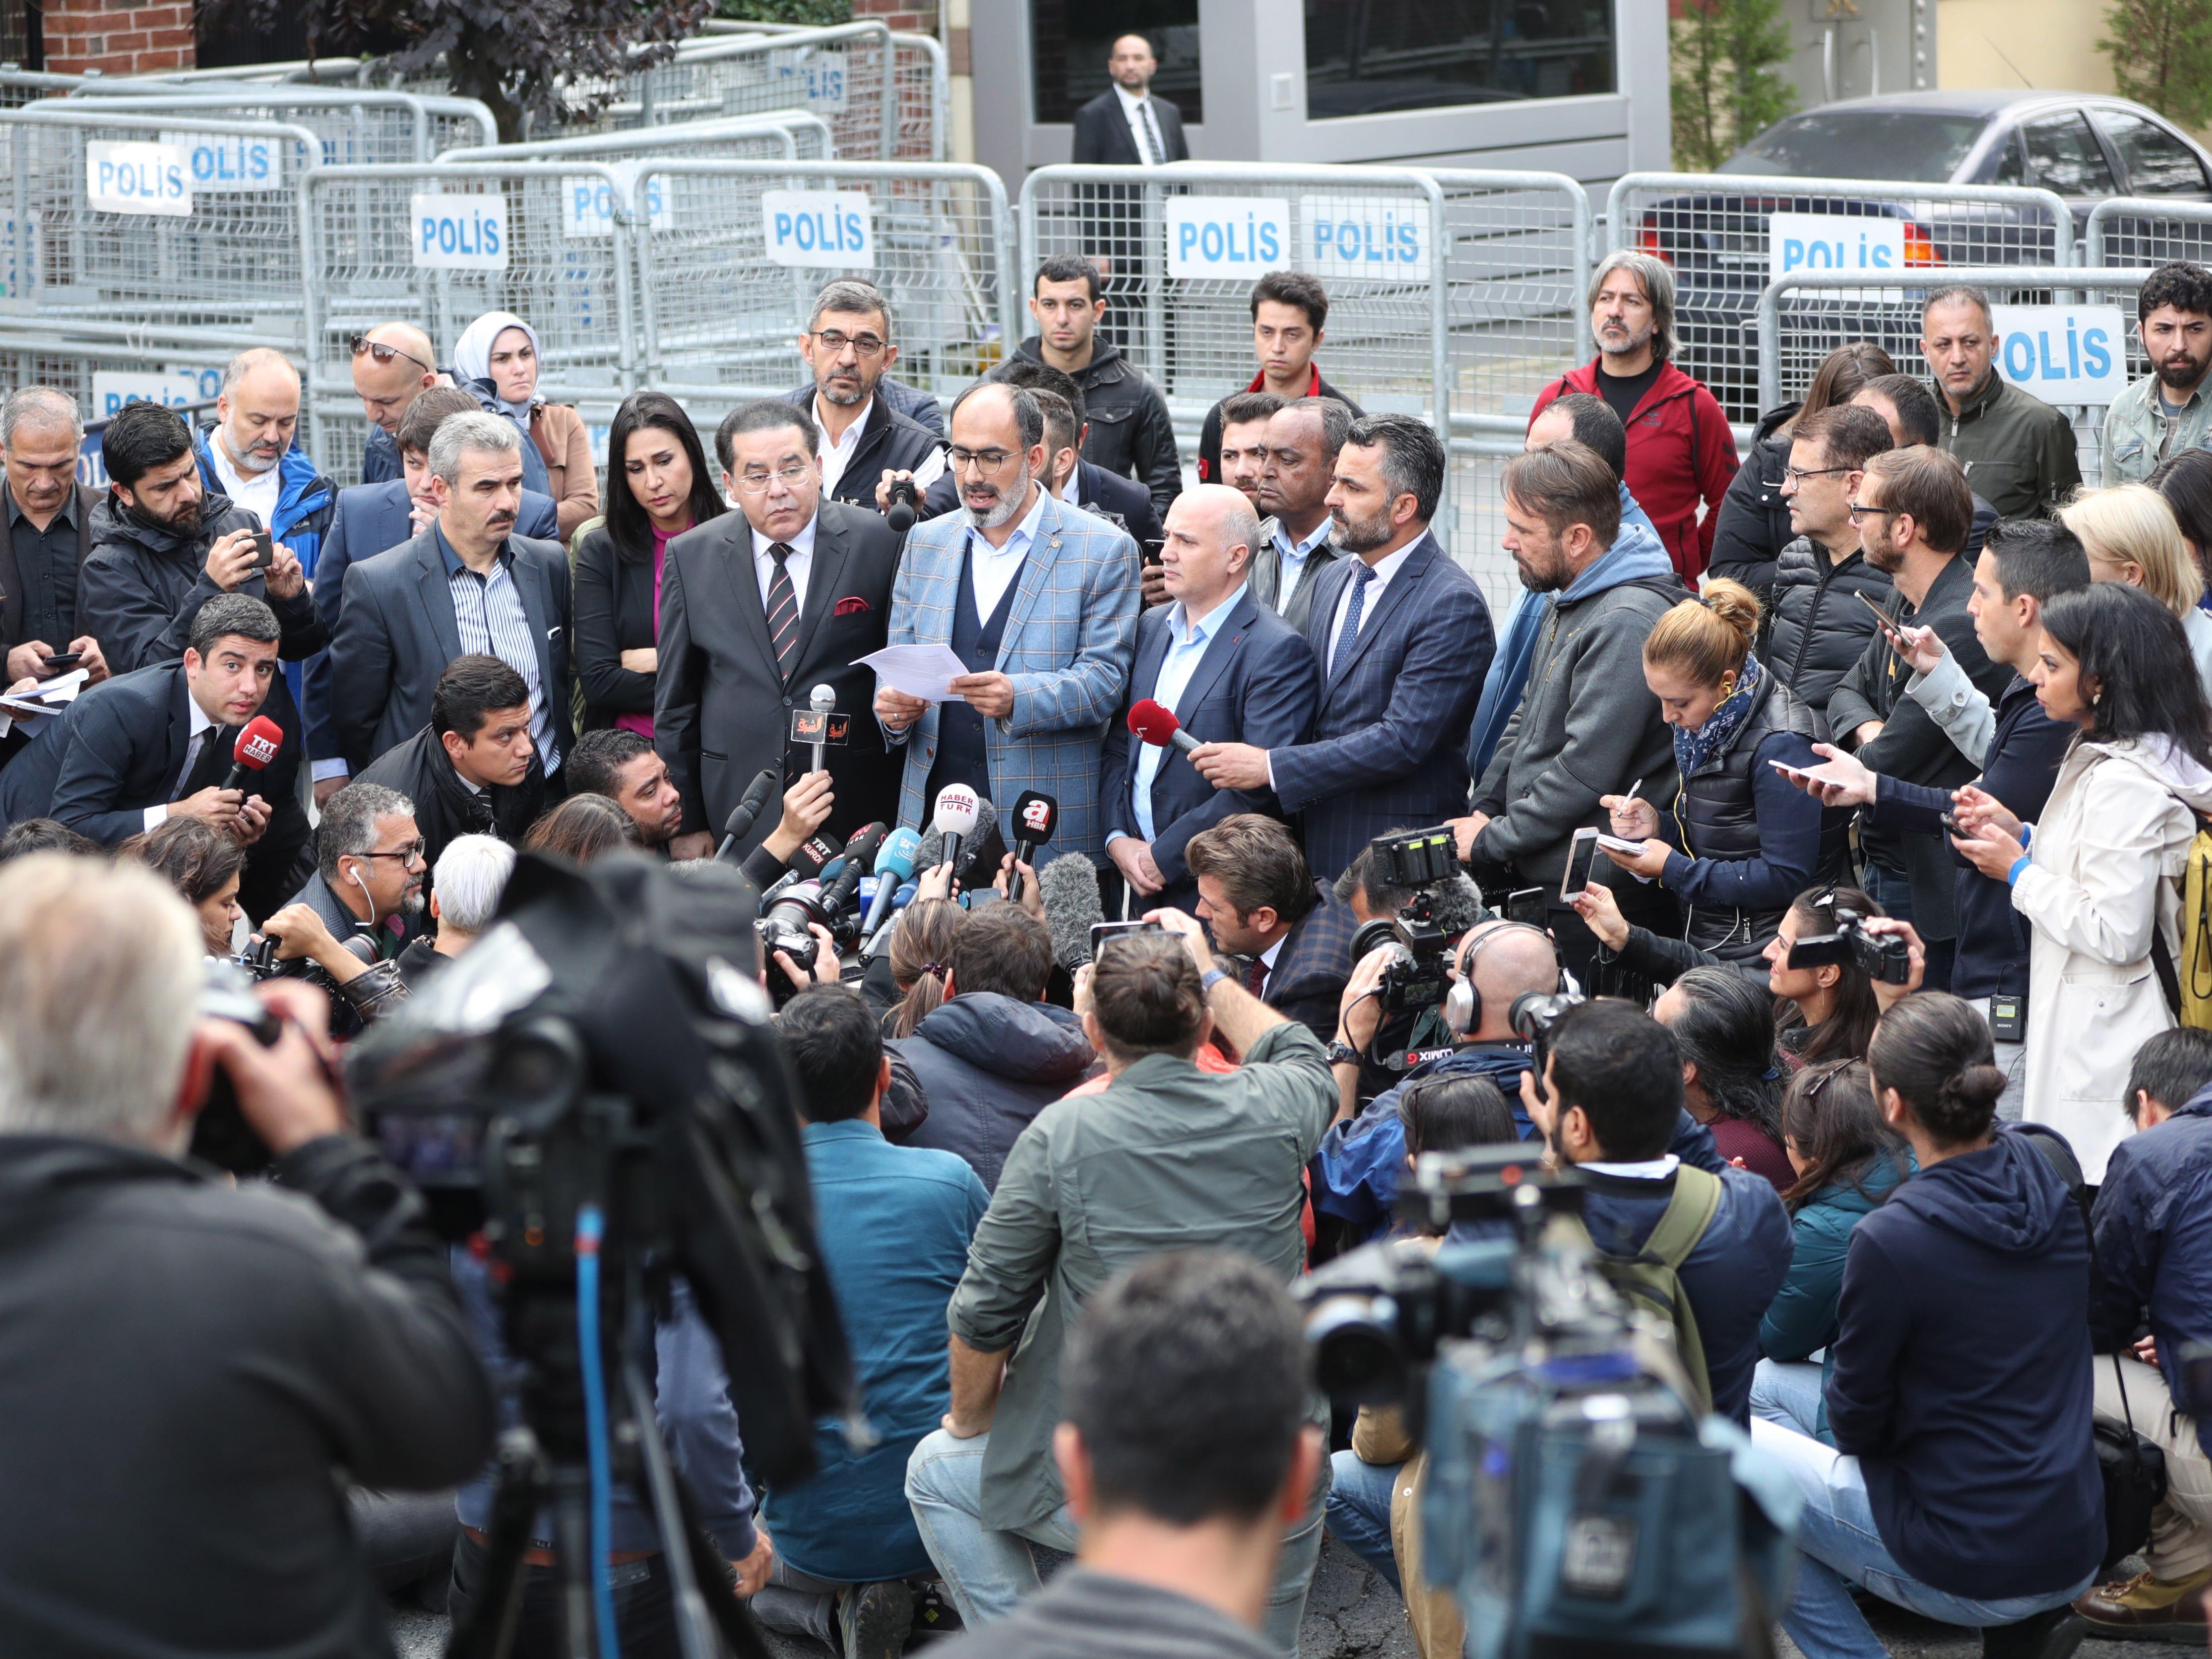 Head of the Turkish - Arab Media Association Turan Kislakci (C) speaks to media in front of the Saudi Arabian consulate in Istanbul, Turkey on Oct. 20, 2018.